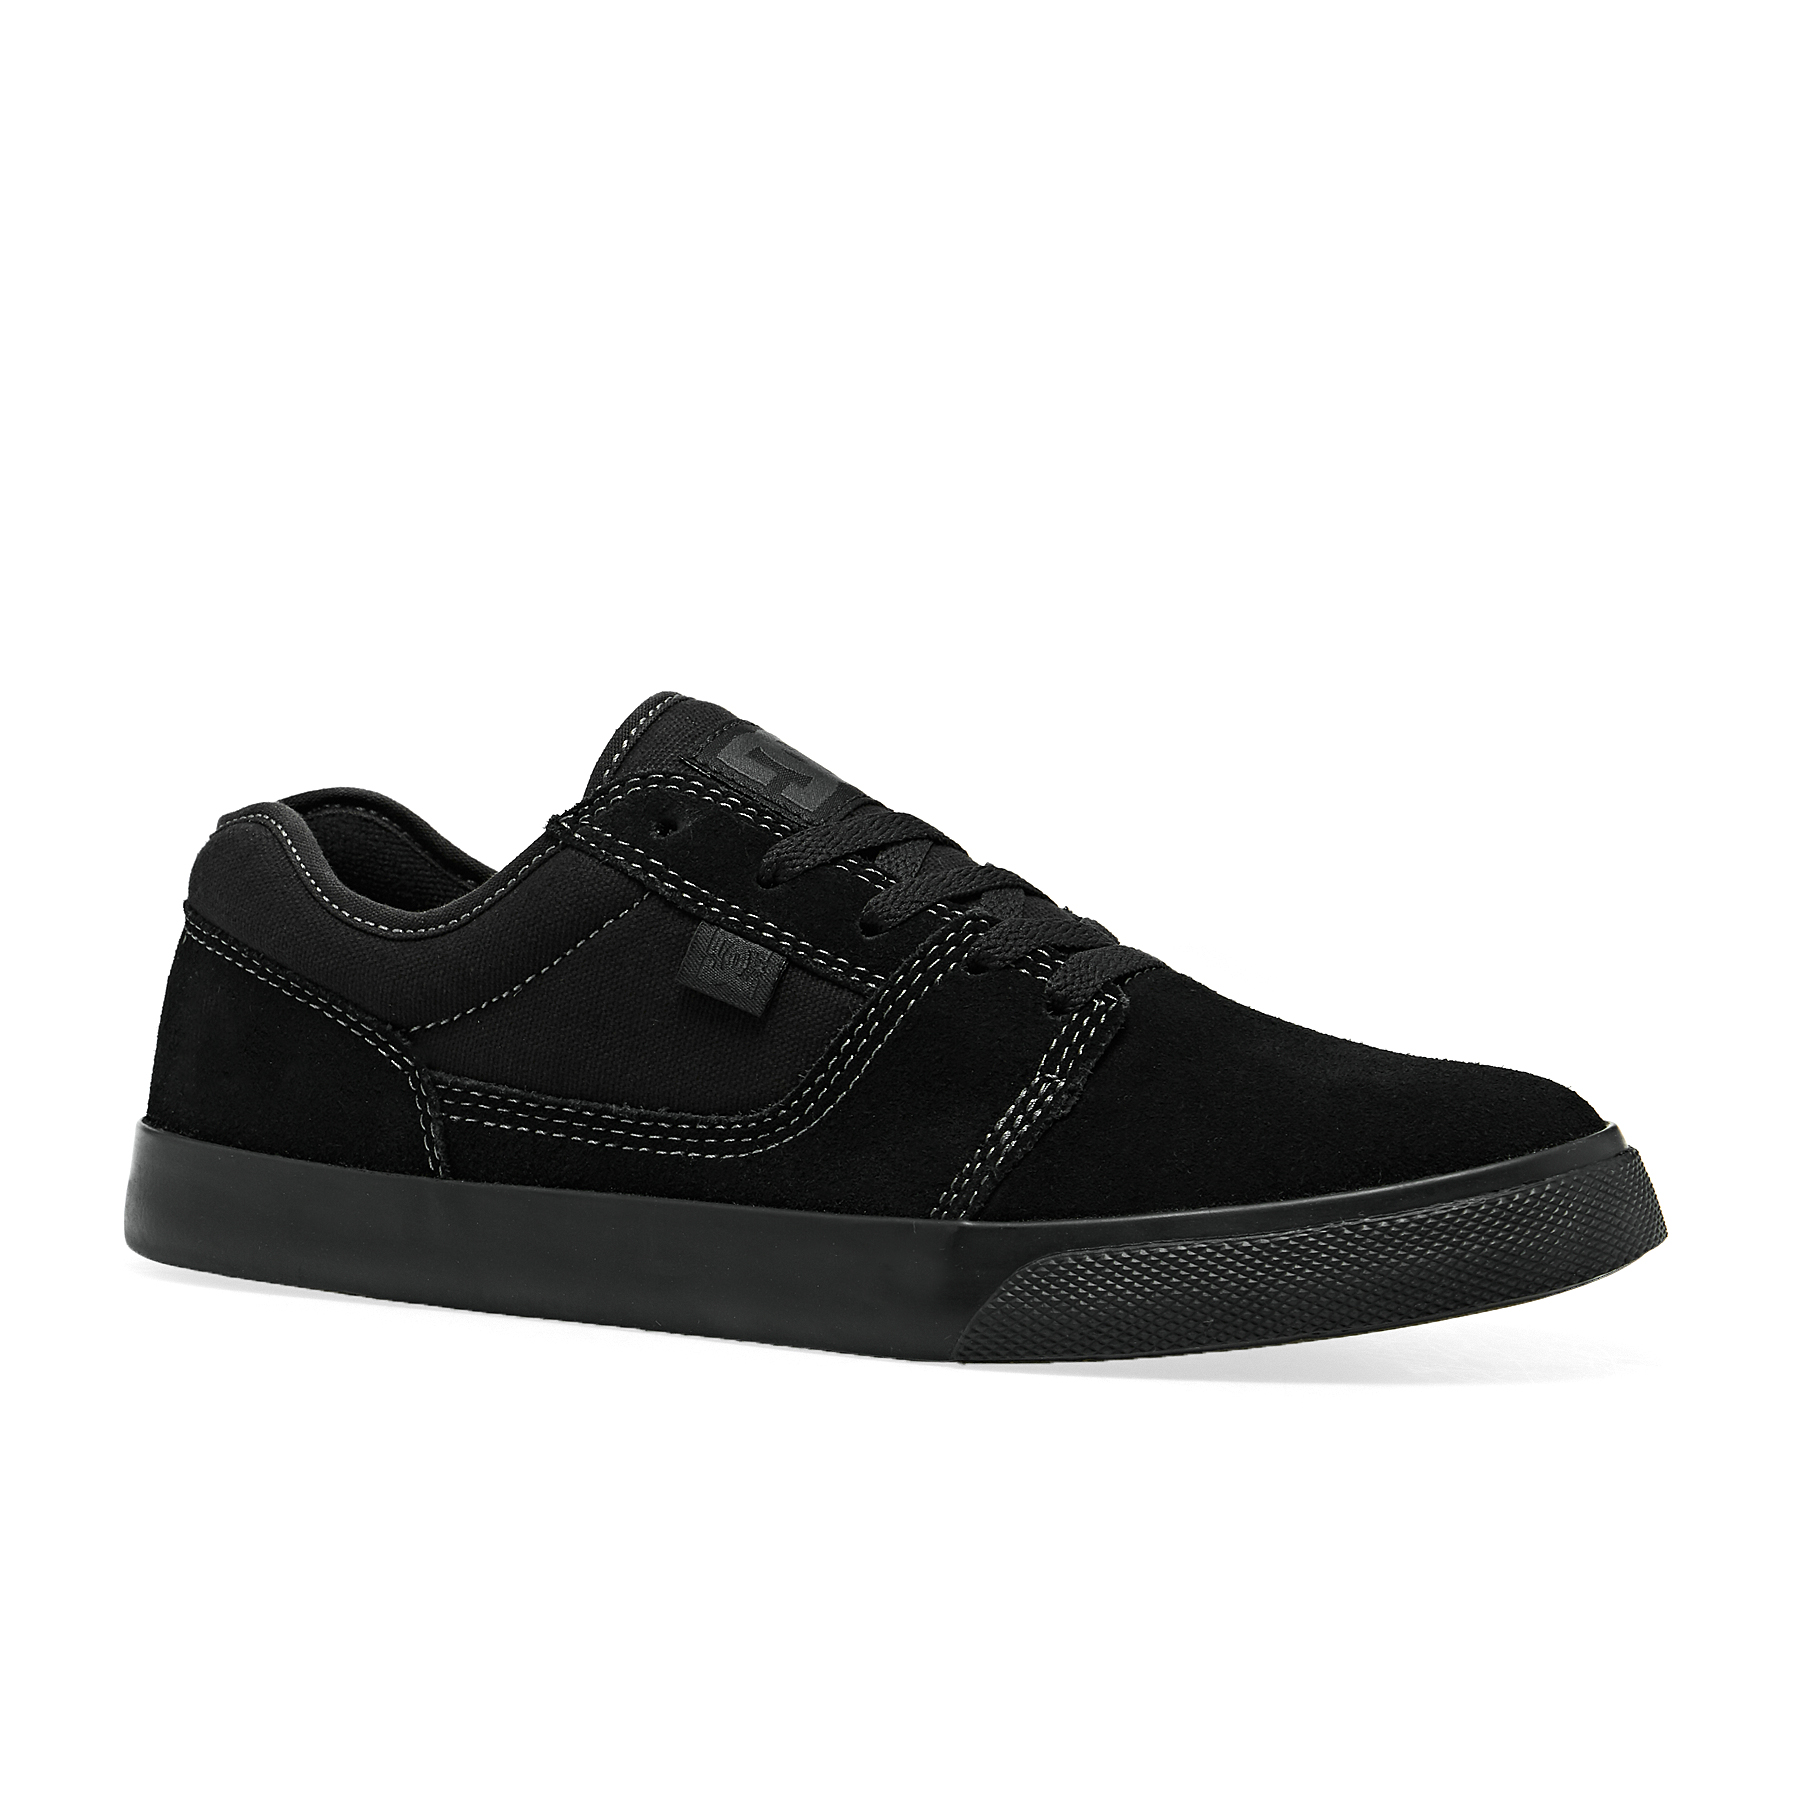 DC Tonik M Shoes - Free Delivery